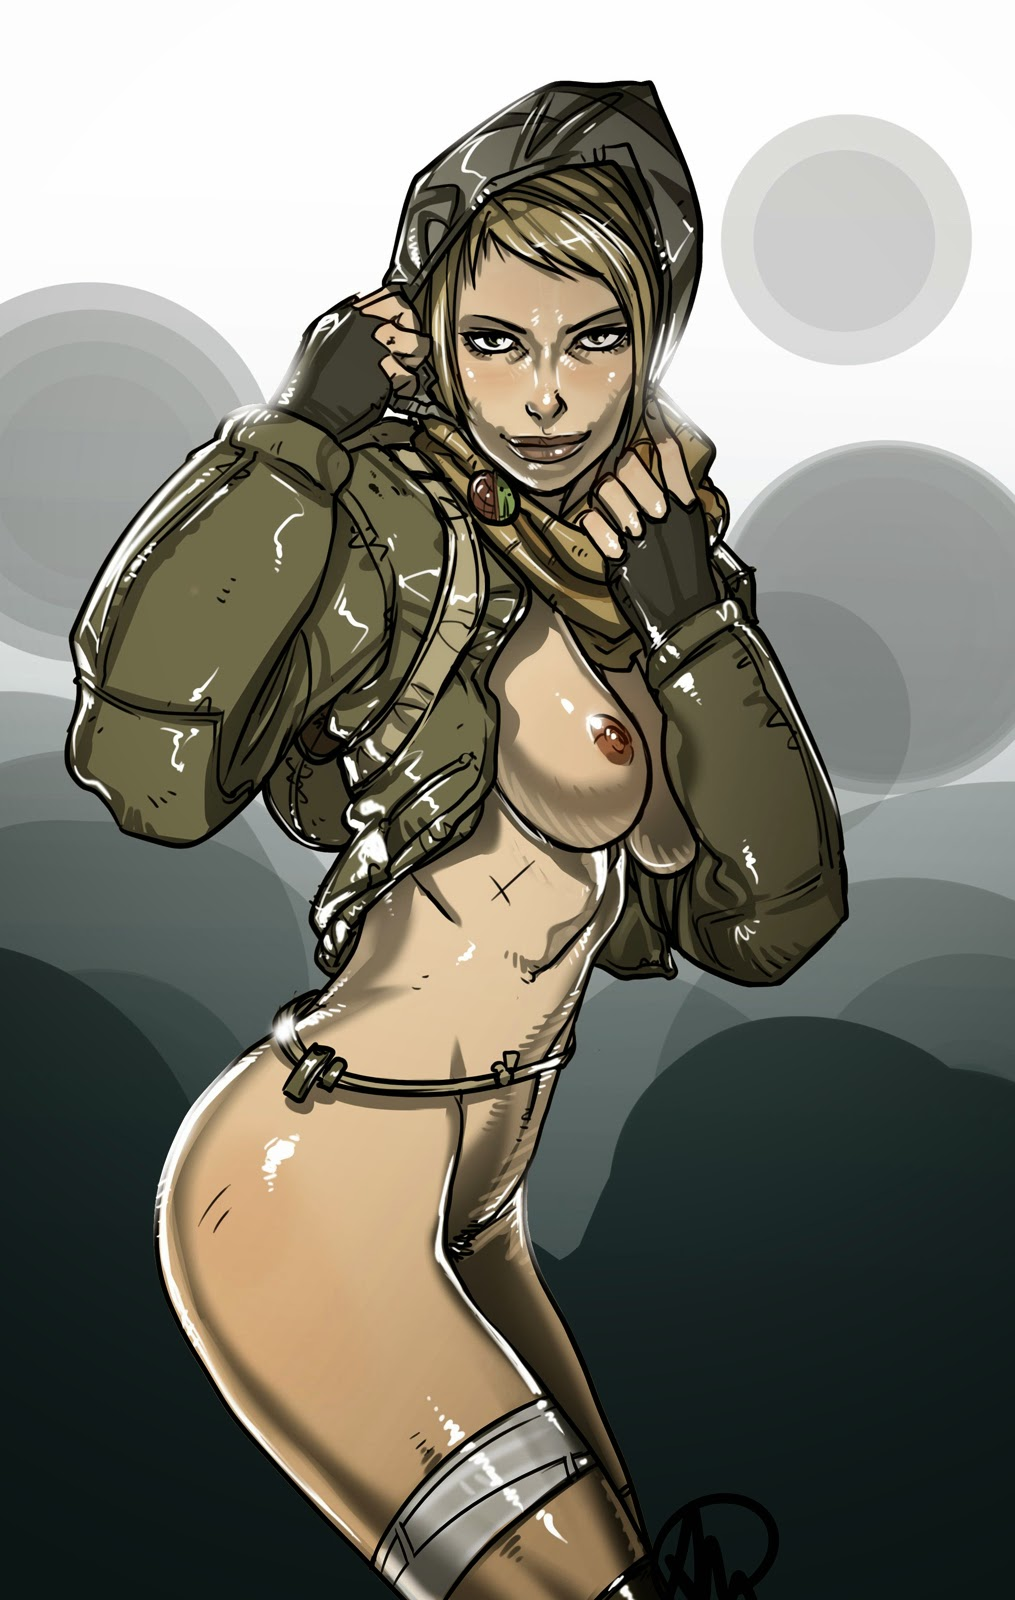 Sexy boobs gogo girl topless table dance vintage 1969 5